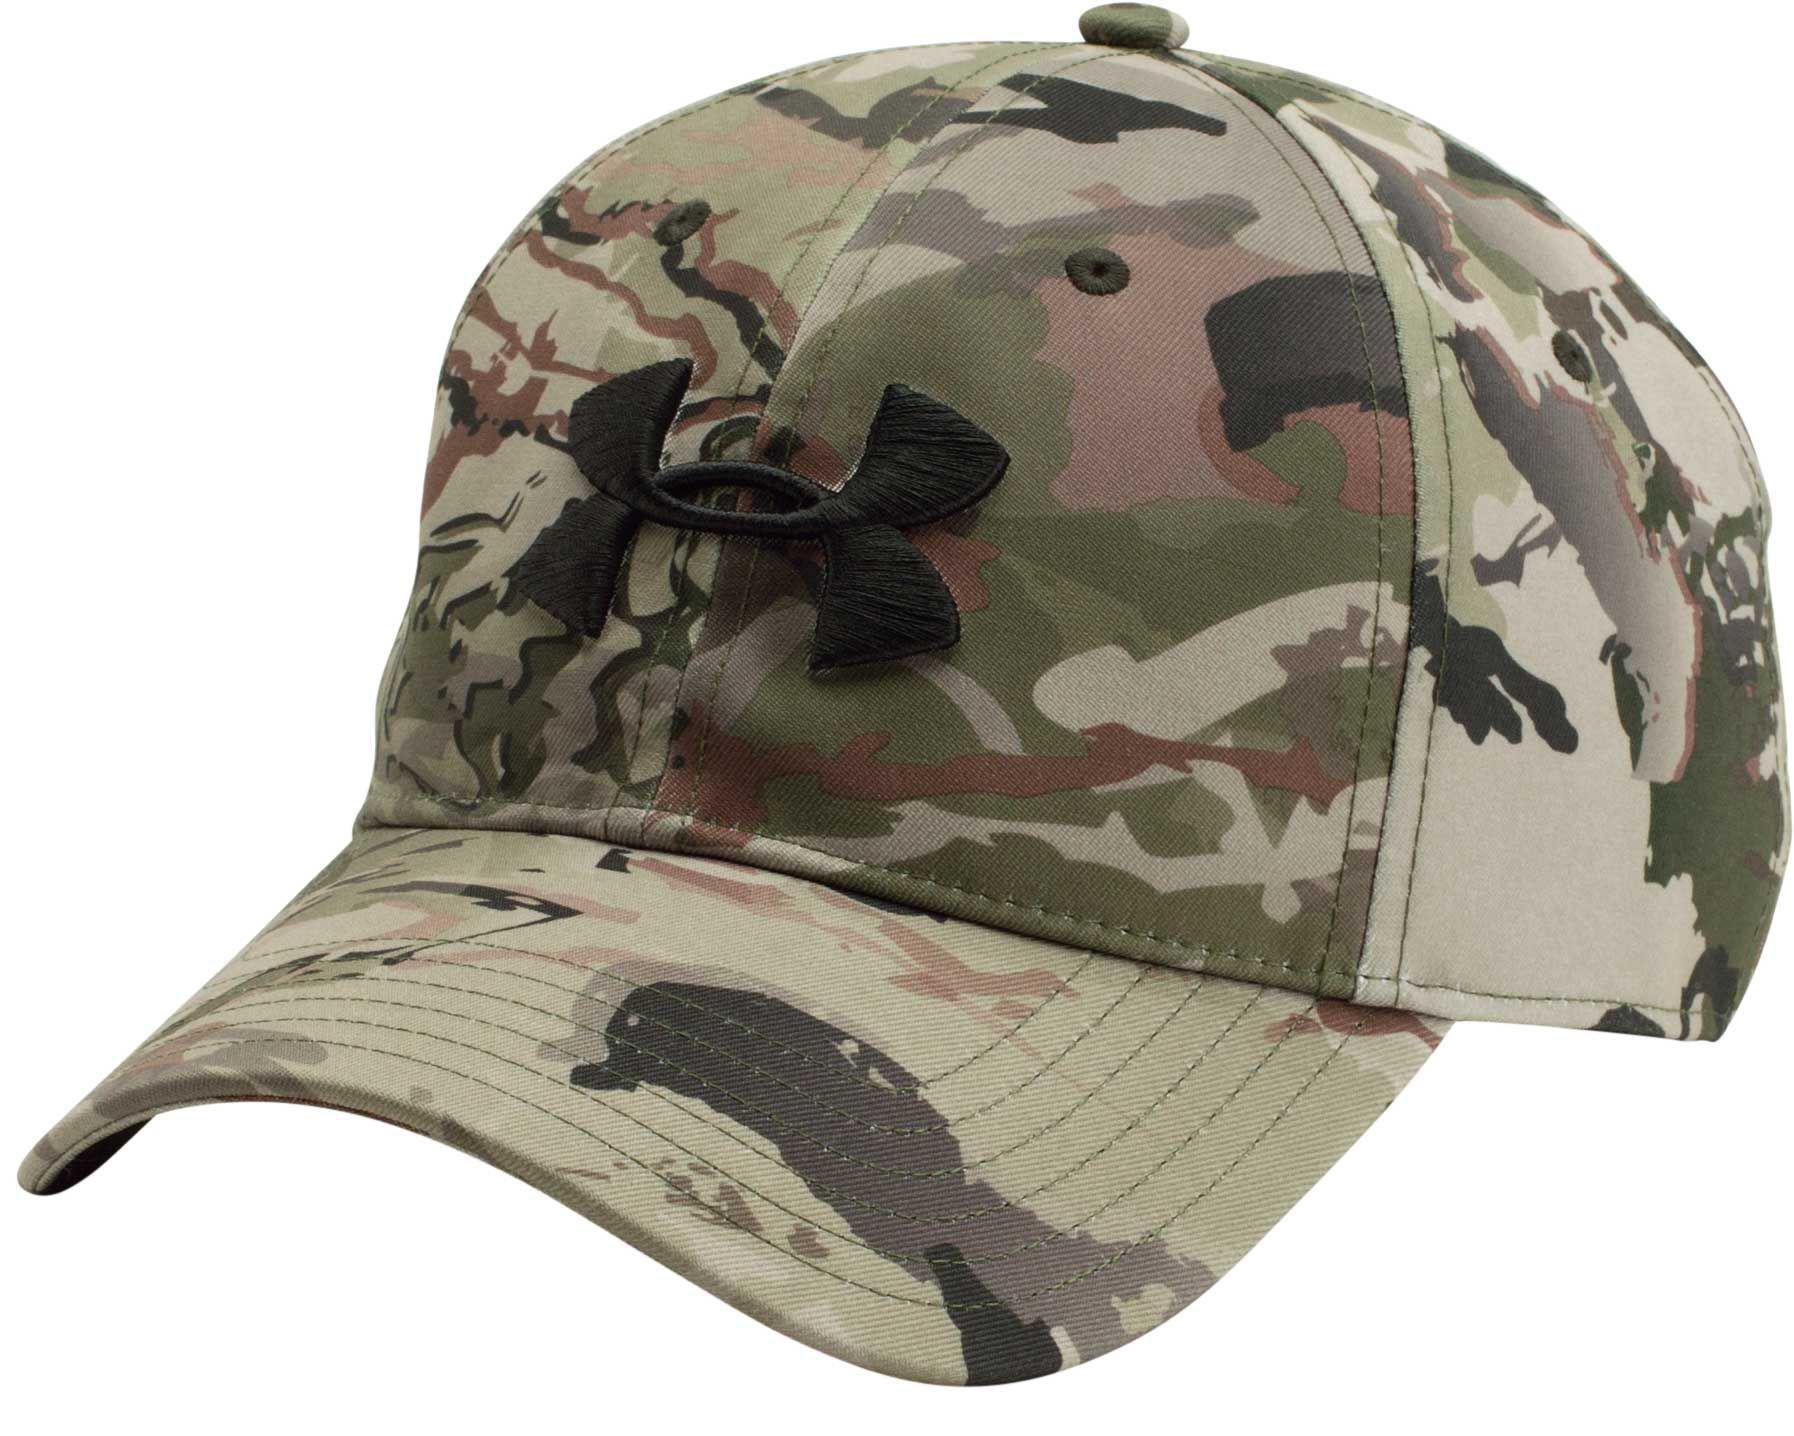 c89890de86e Under Armour - Multicolor Camo 2.0 Hunting Hat for Men - Lyst